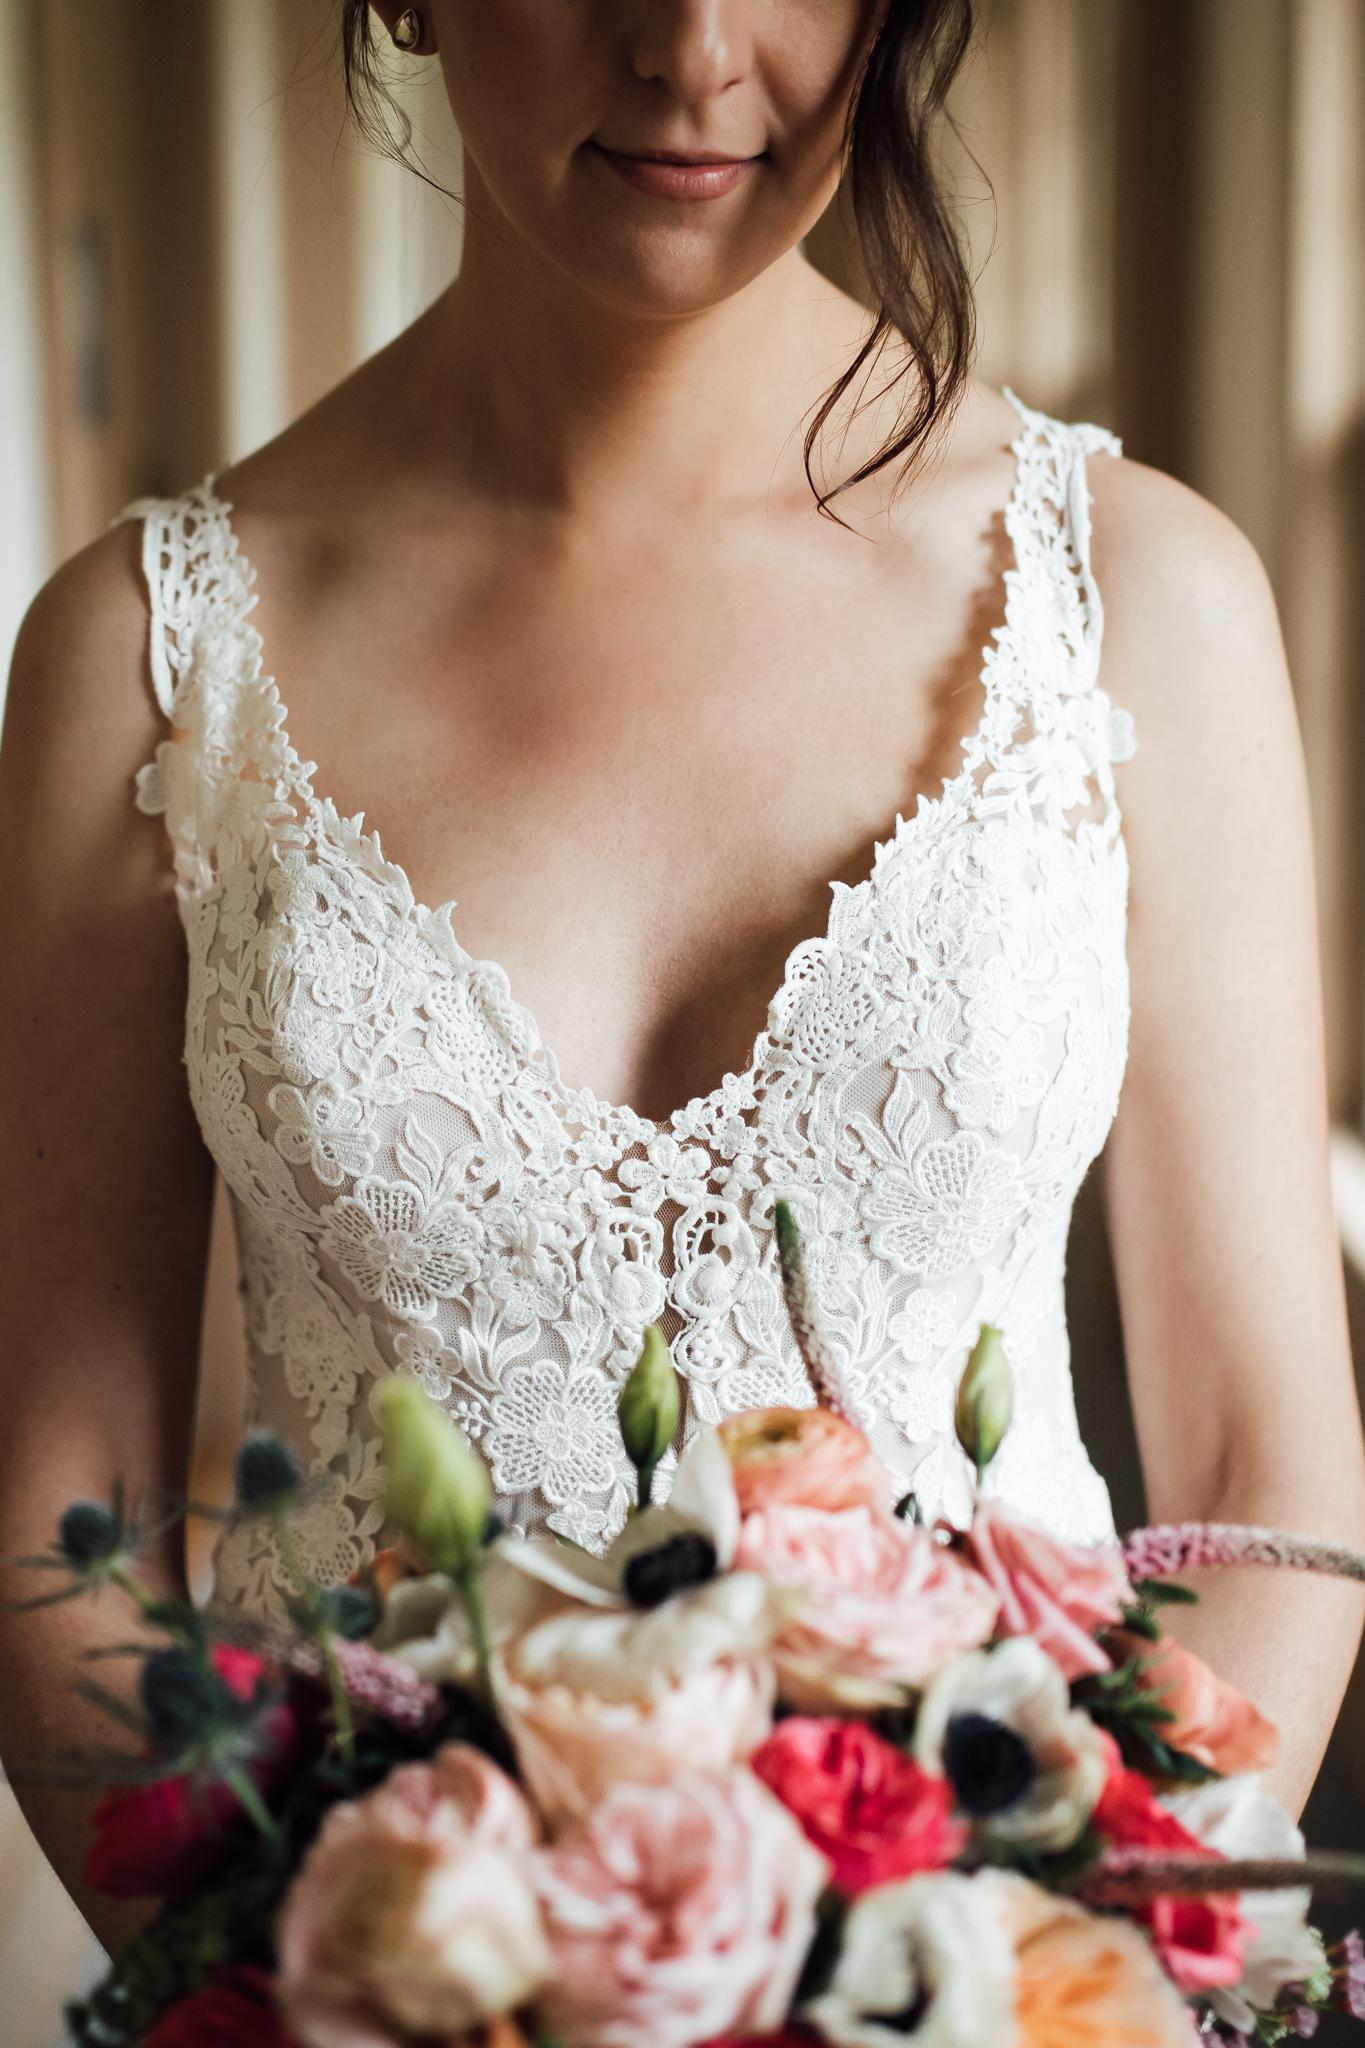 birmingham-alabama-wedding-photographer-laura-terry-the-warmth-around-you (80 of 110).jpg